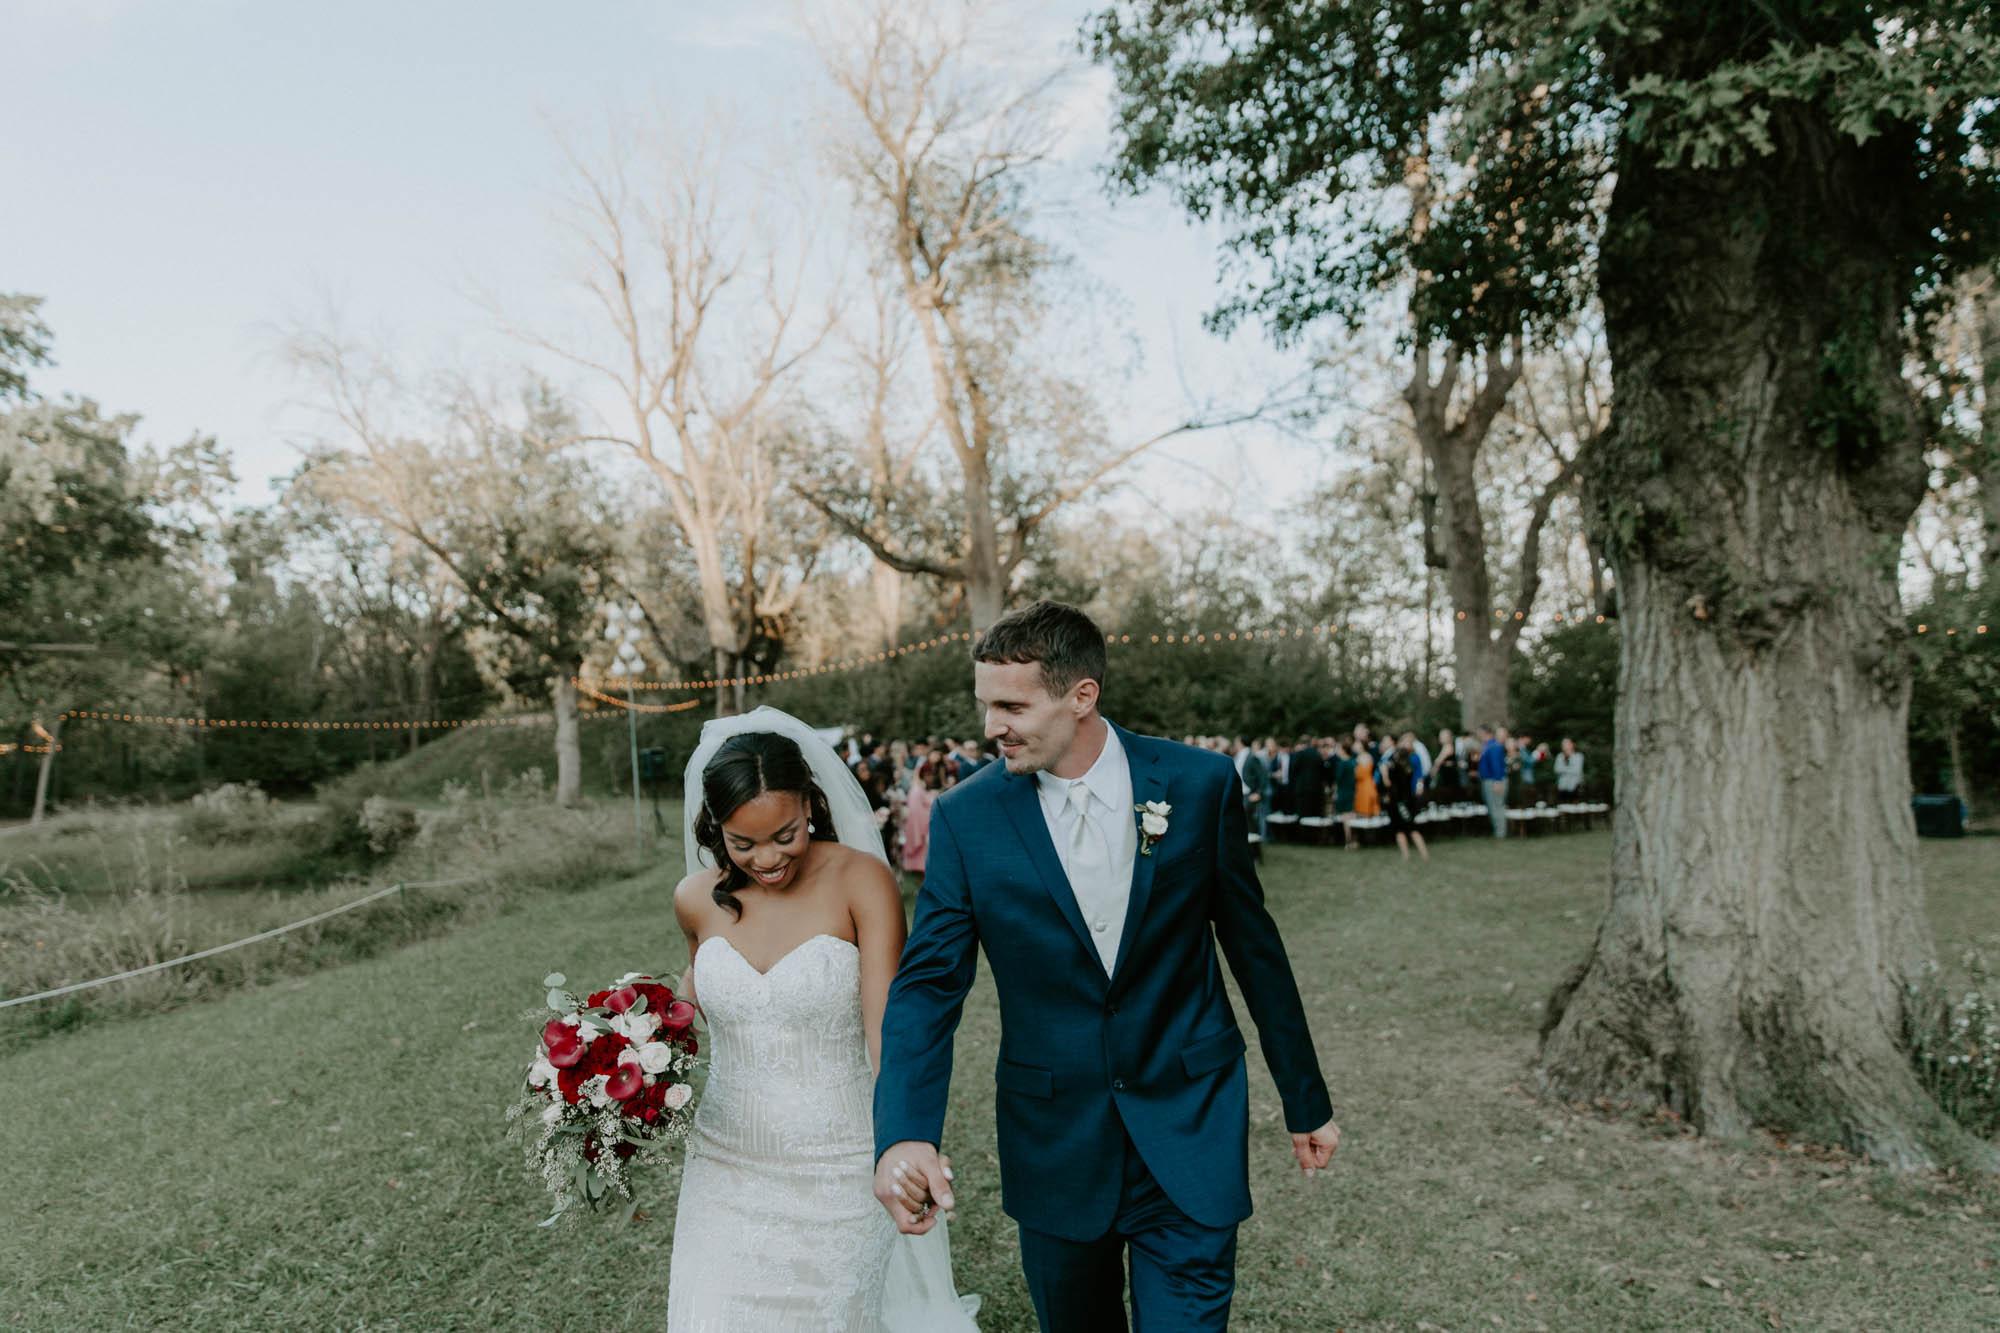 prairie_glass_house_wedding_champaign_wright_photographs_simon_0087.jpg